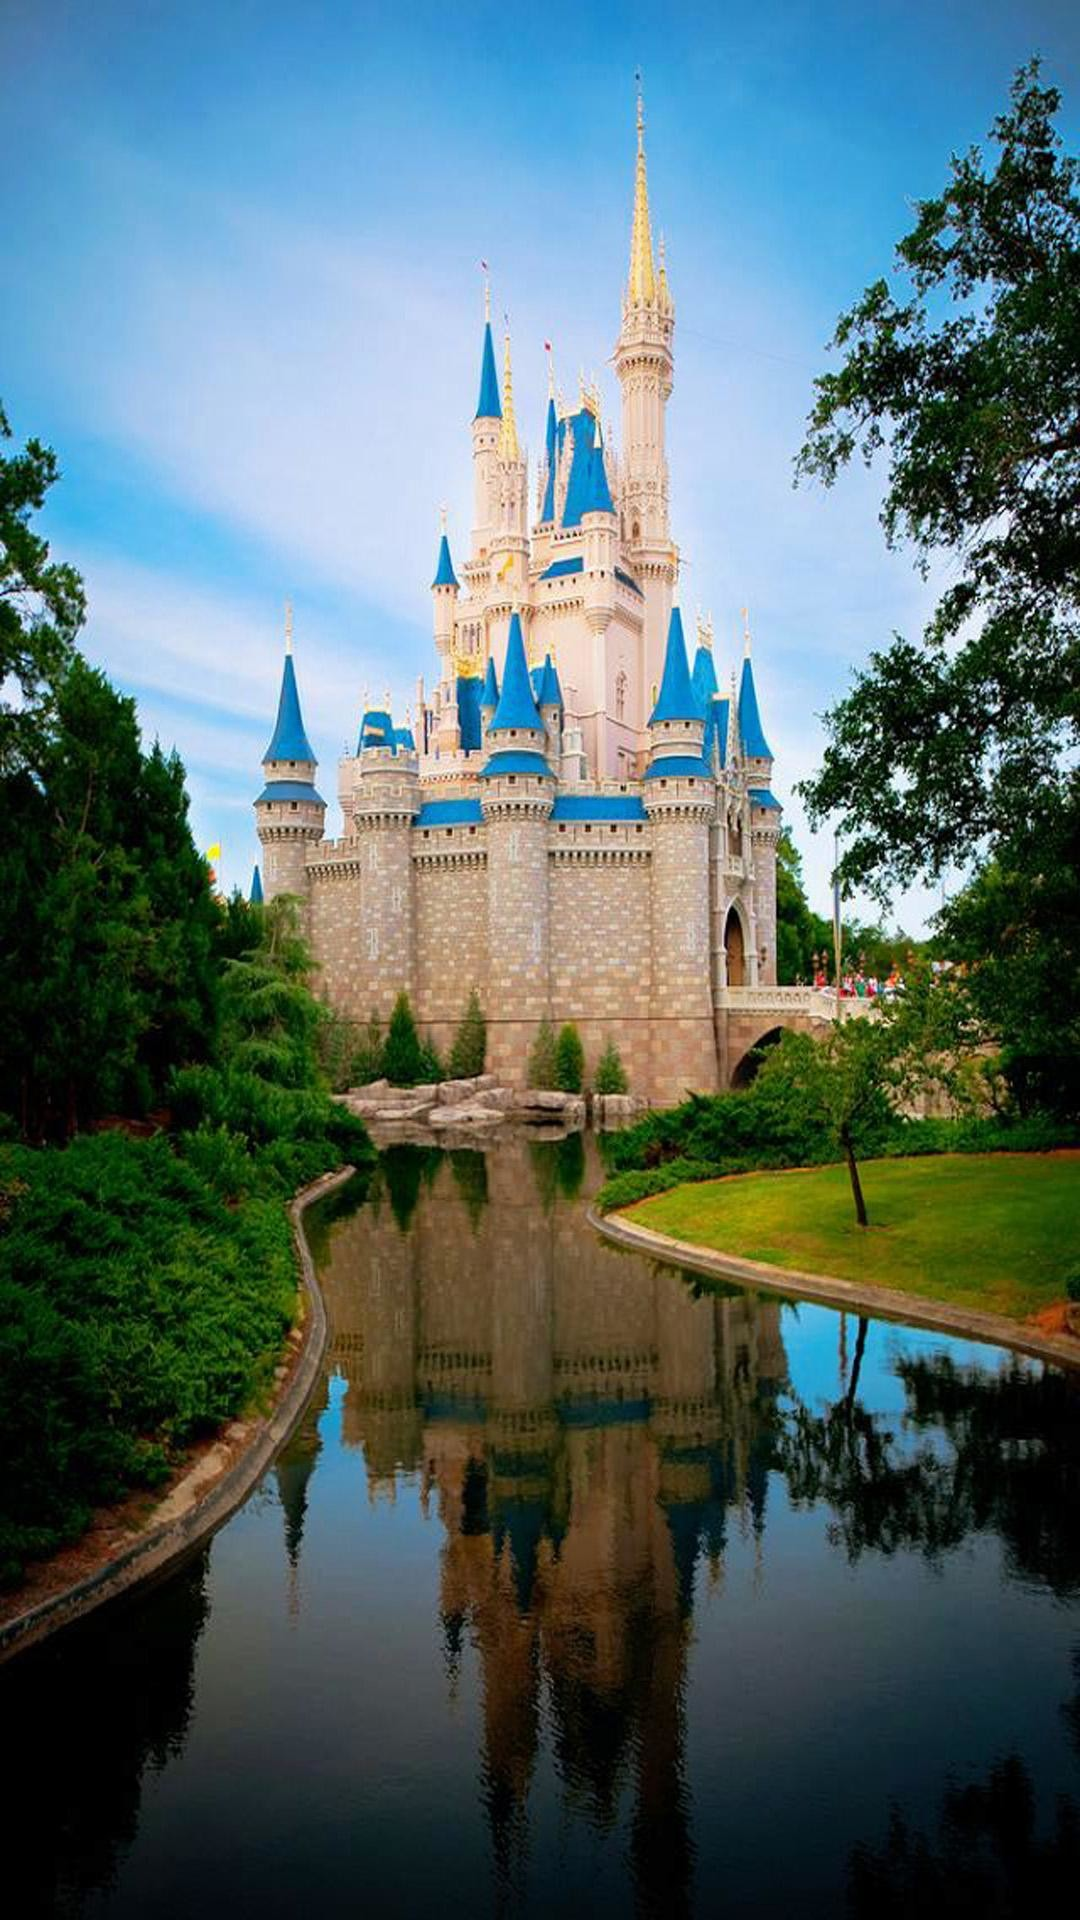 Cinderella Castle Iphone Wallpapers